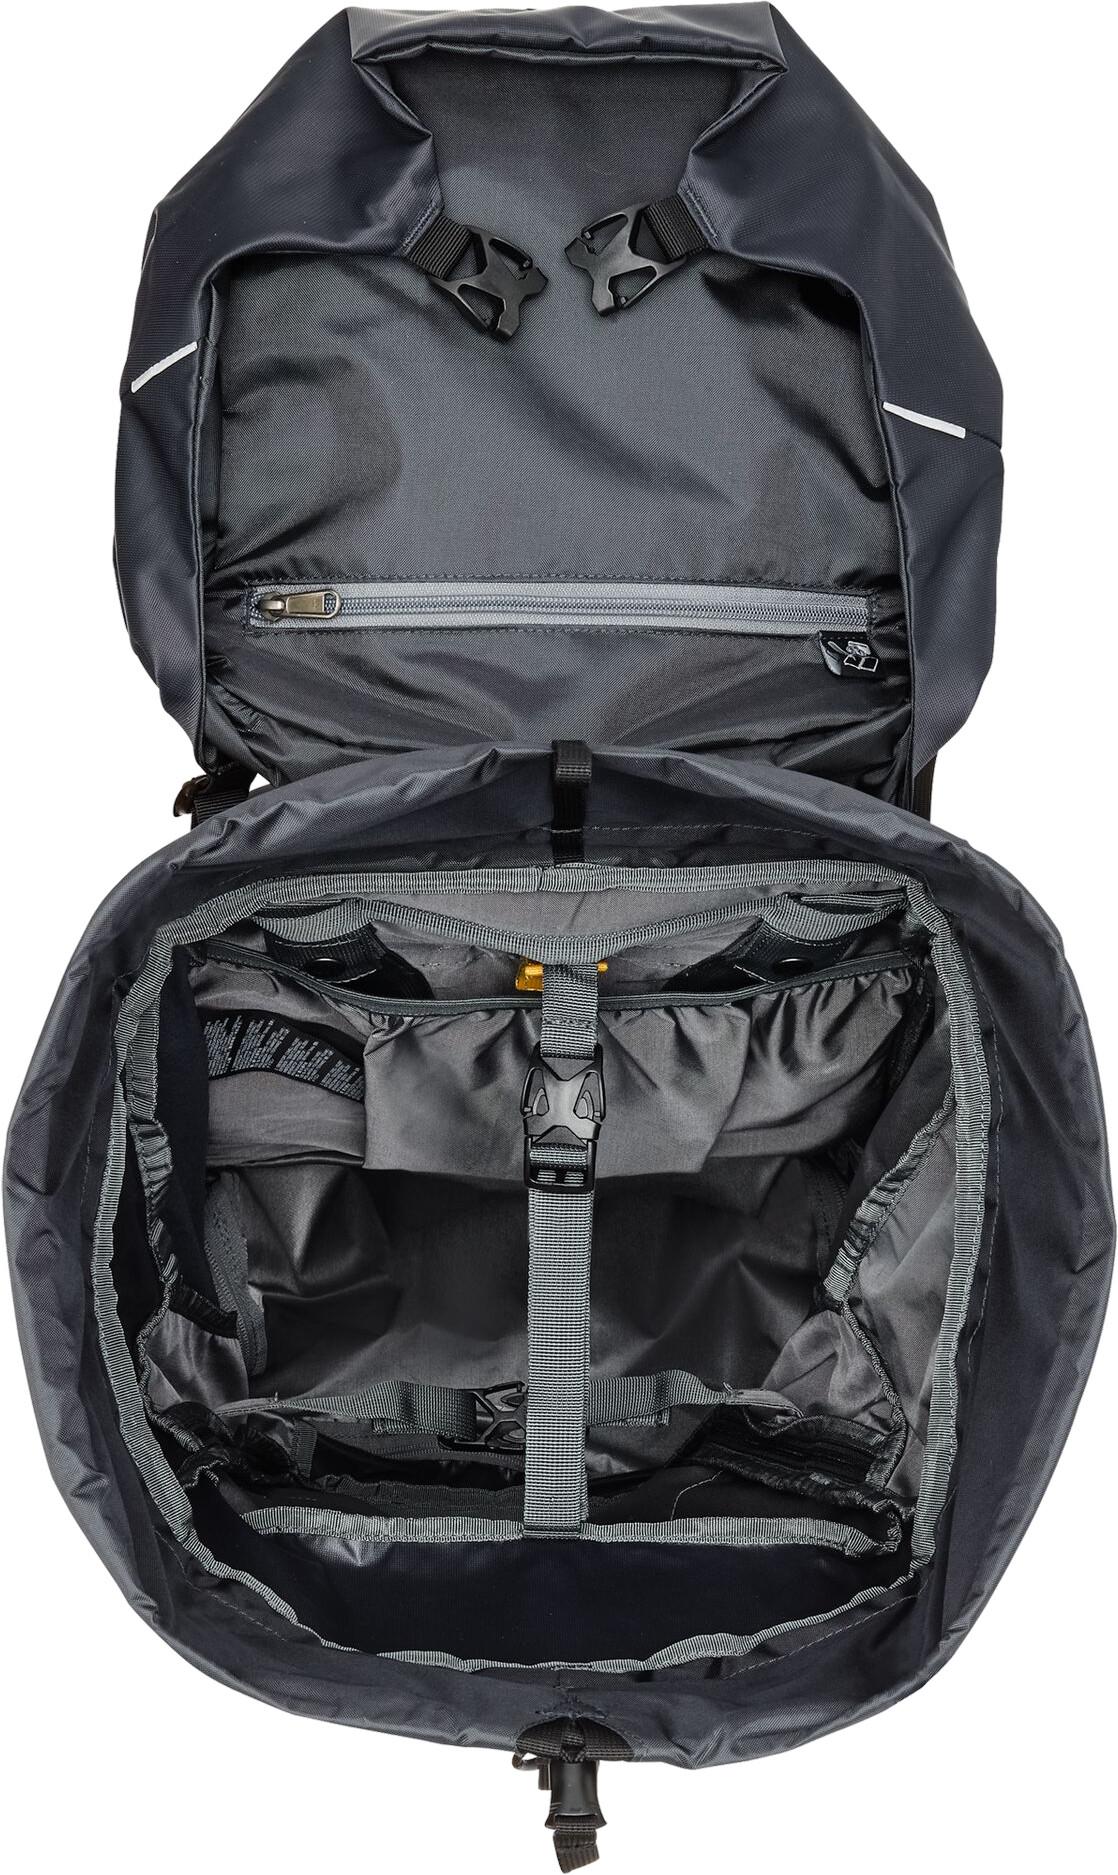 Jack Wolfskin Denali 65 L trekking backpack black